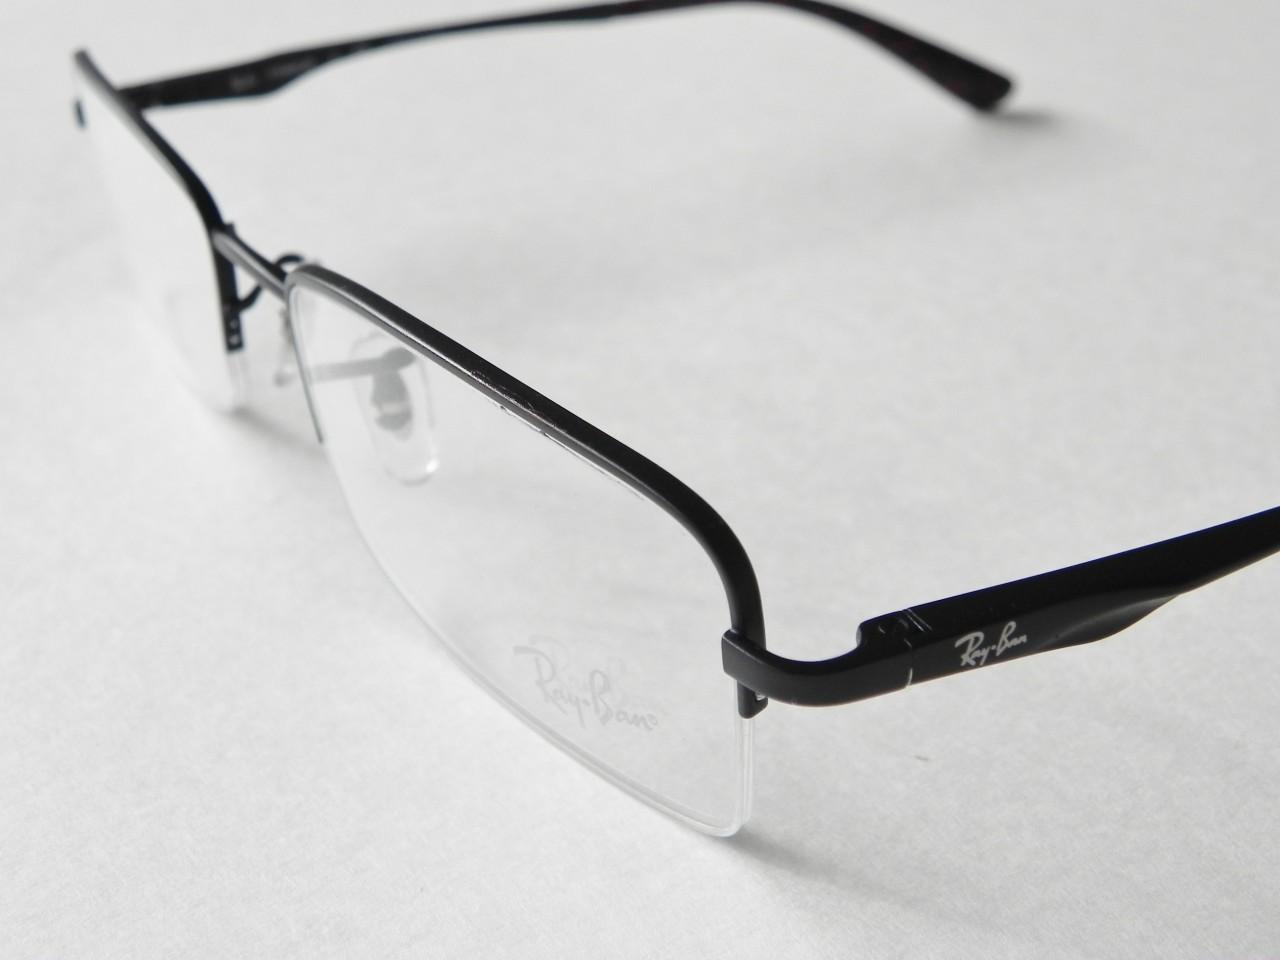 Ray Ban Rimless Eyeglasses